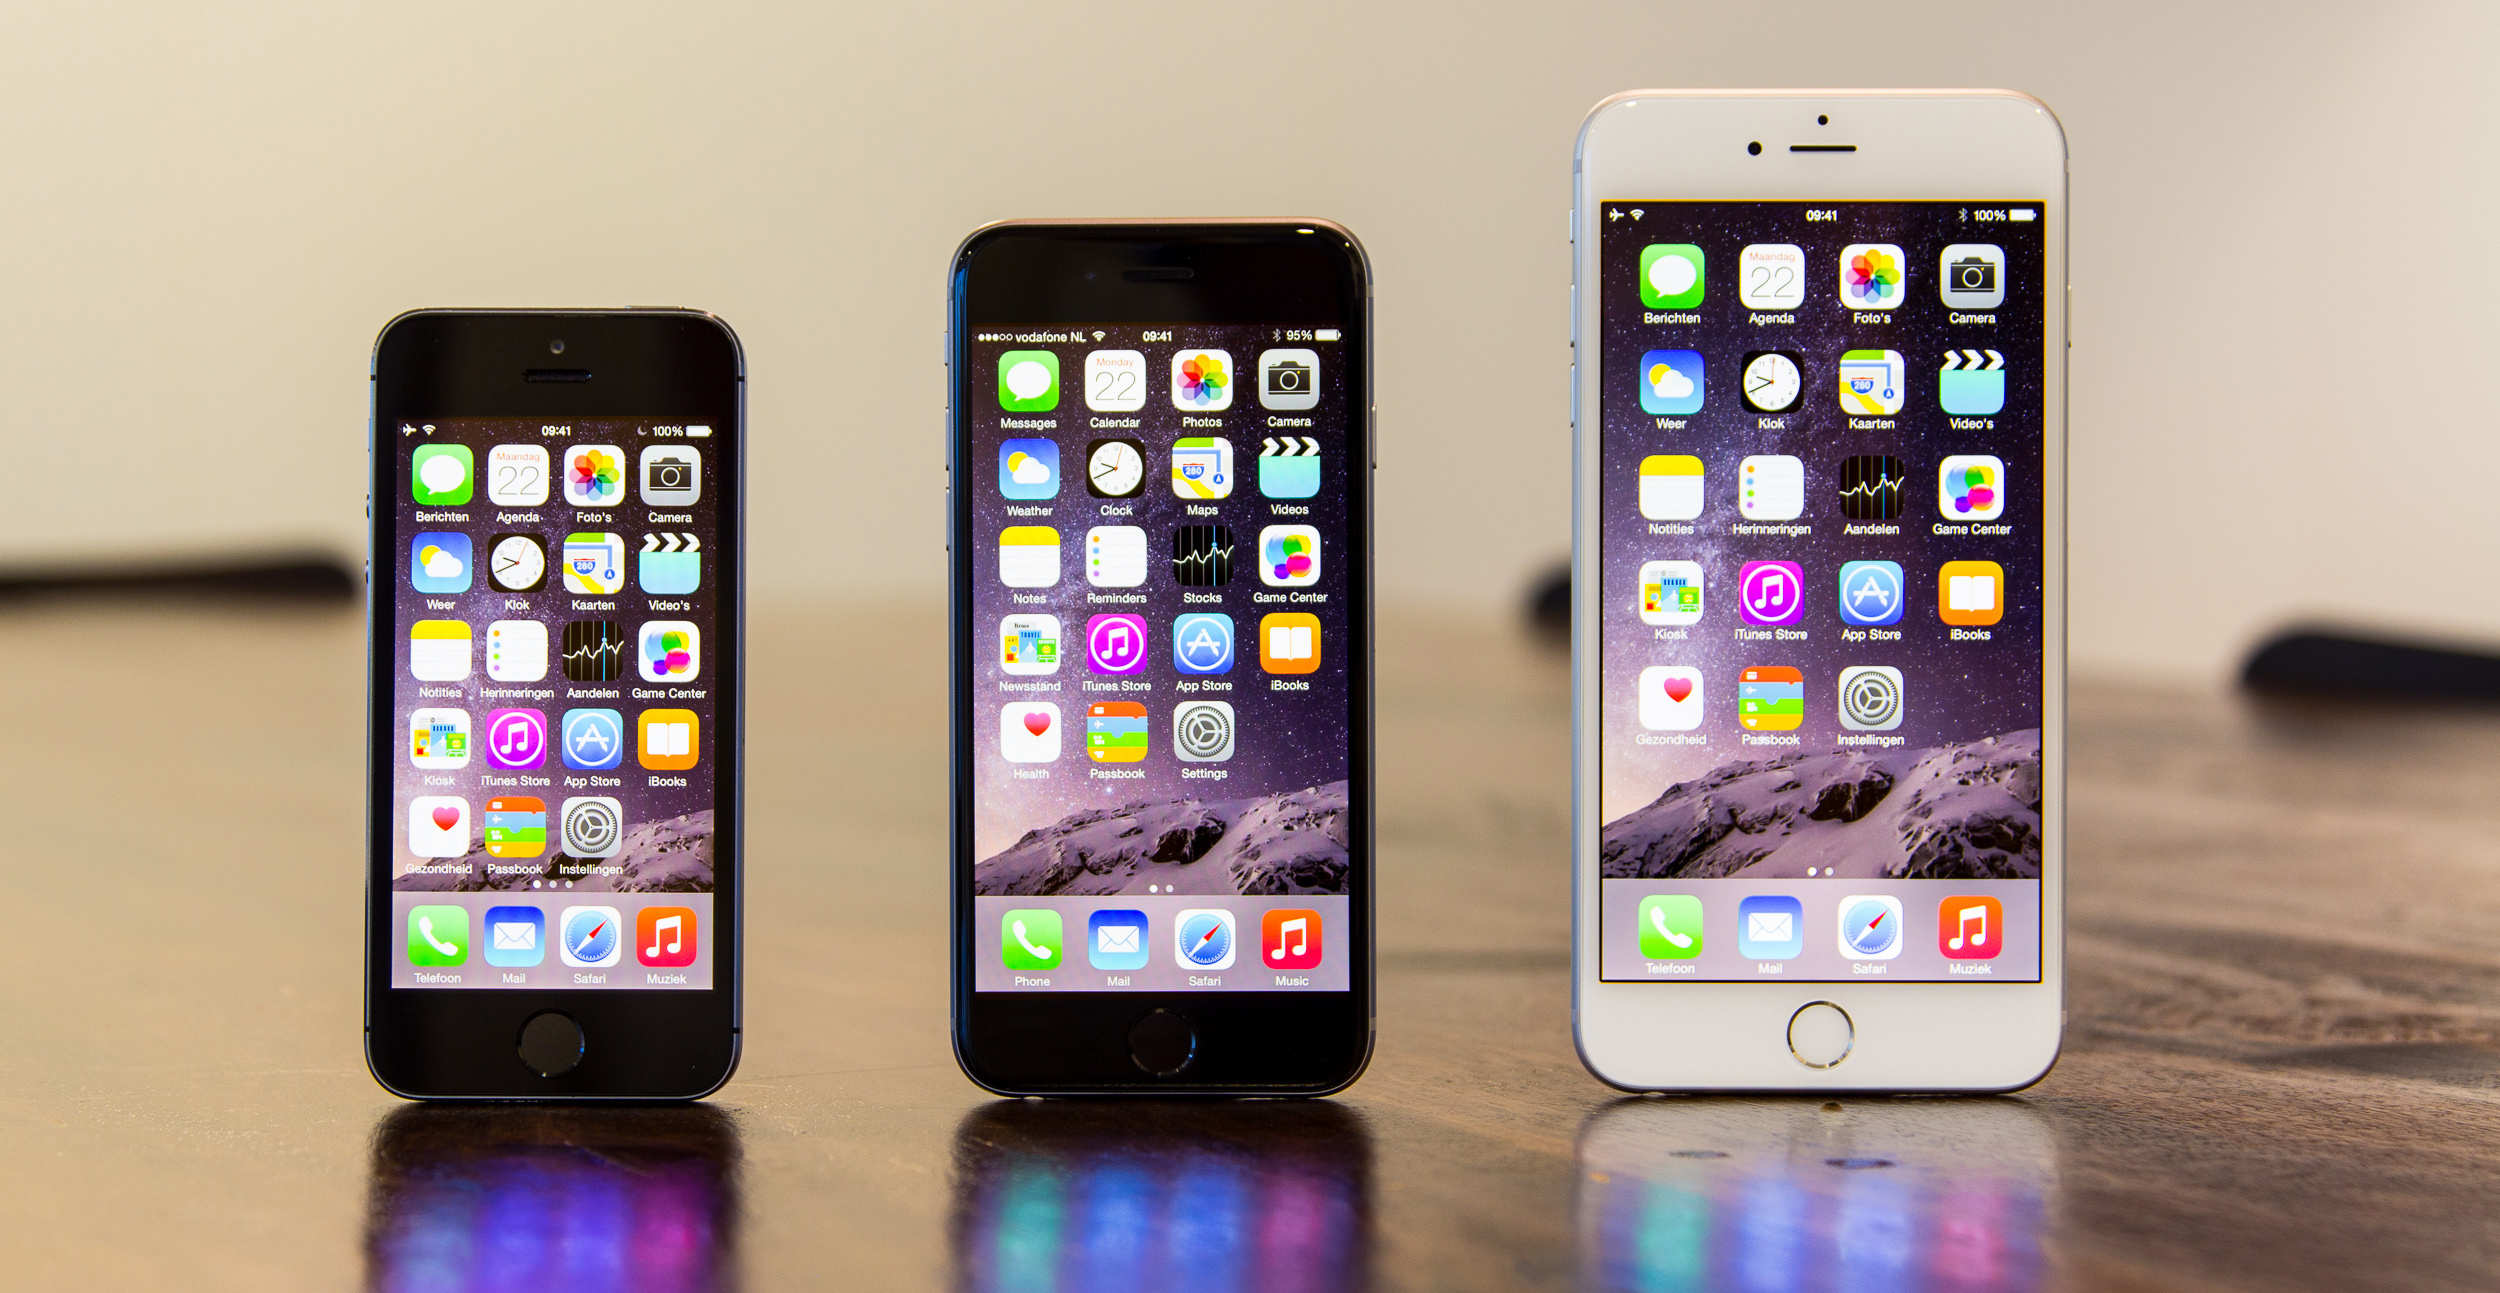 apple iphone 6 plus review behuizing een reusachtige. Black Bedroom Furniture Sets. Home Design Ideas